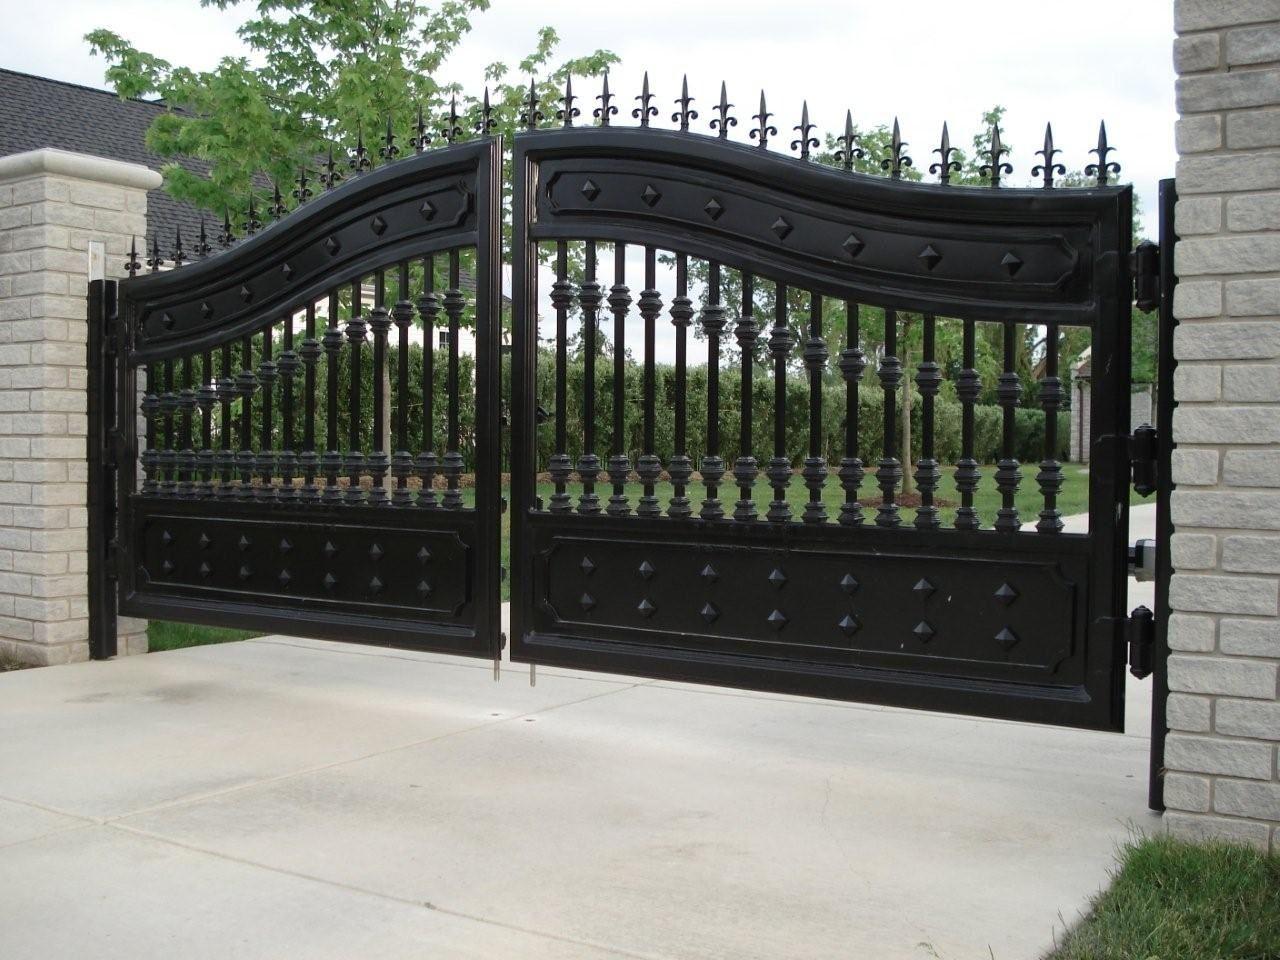 Luxury Wrought Iron Gate Fg 022 Buy Luxury Wrought Iron Gate Main Iron Gate New Design Iron Gate Pro Entrance Gates Design Iron Gate Design Front Gate Design